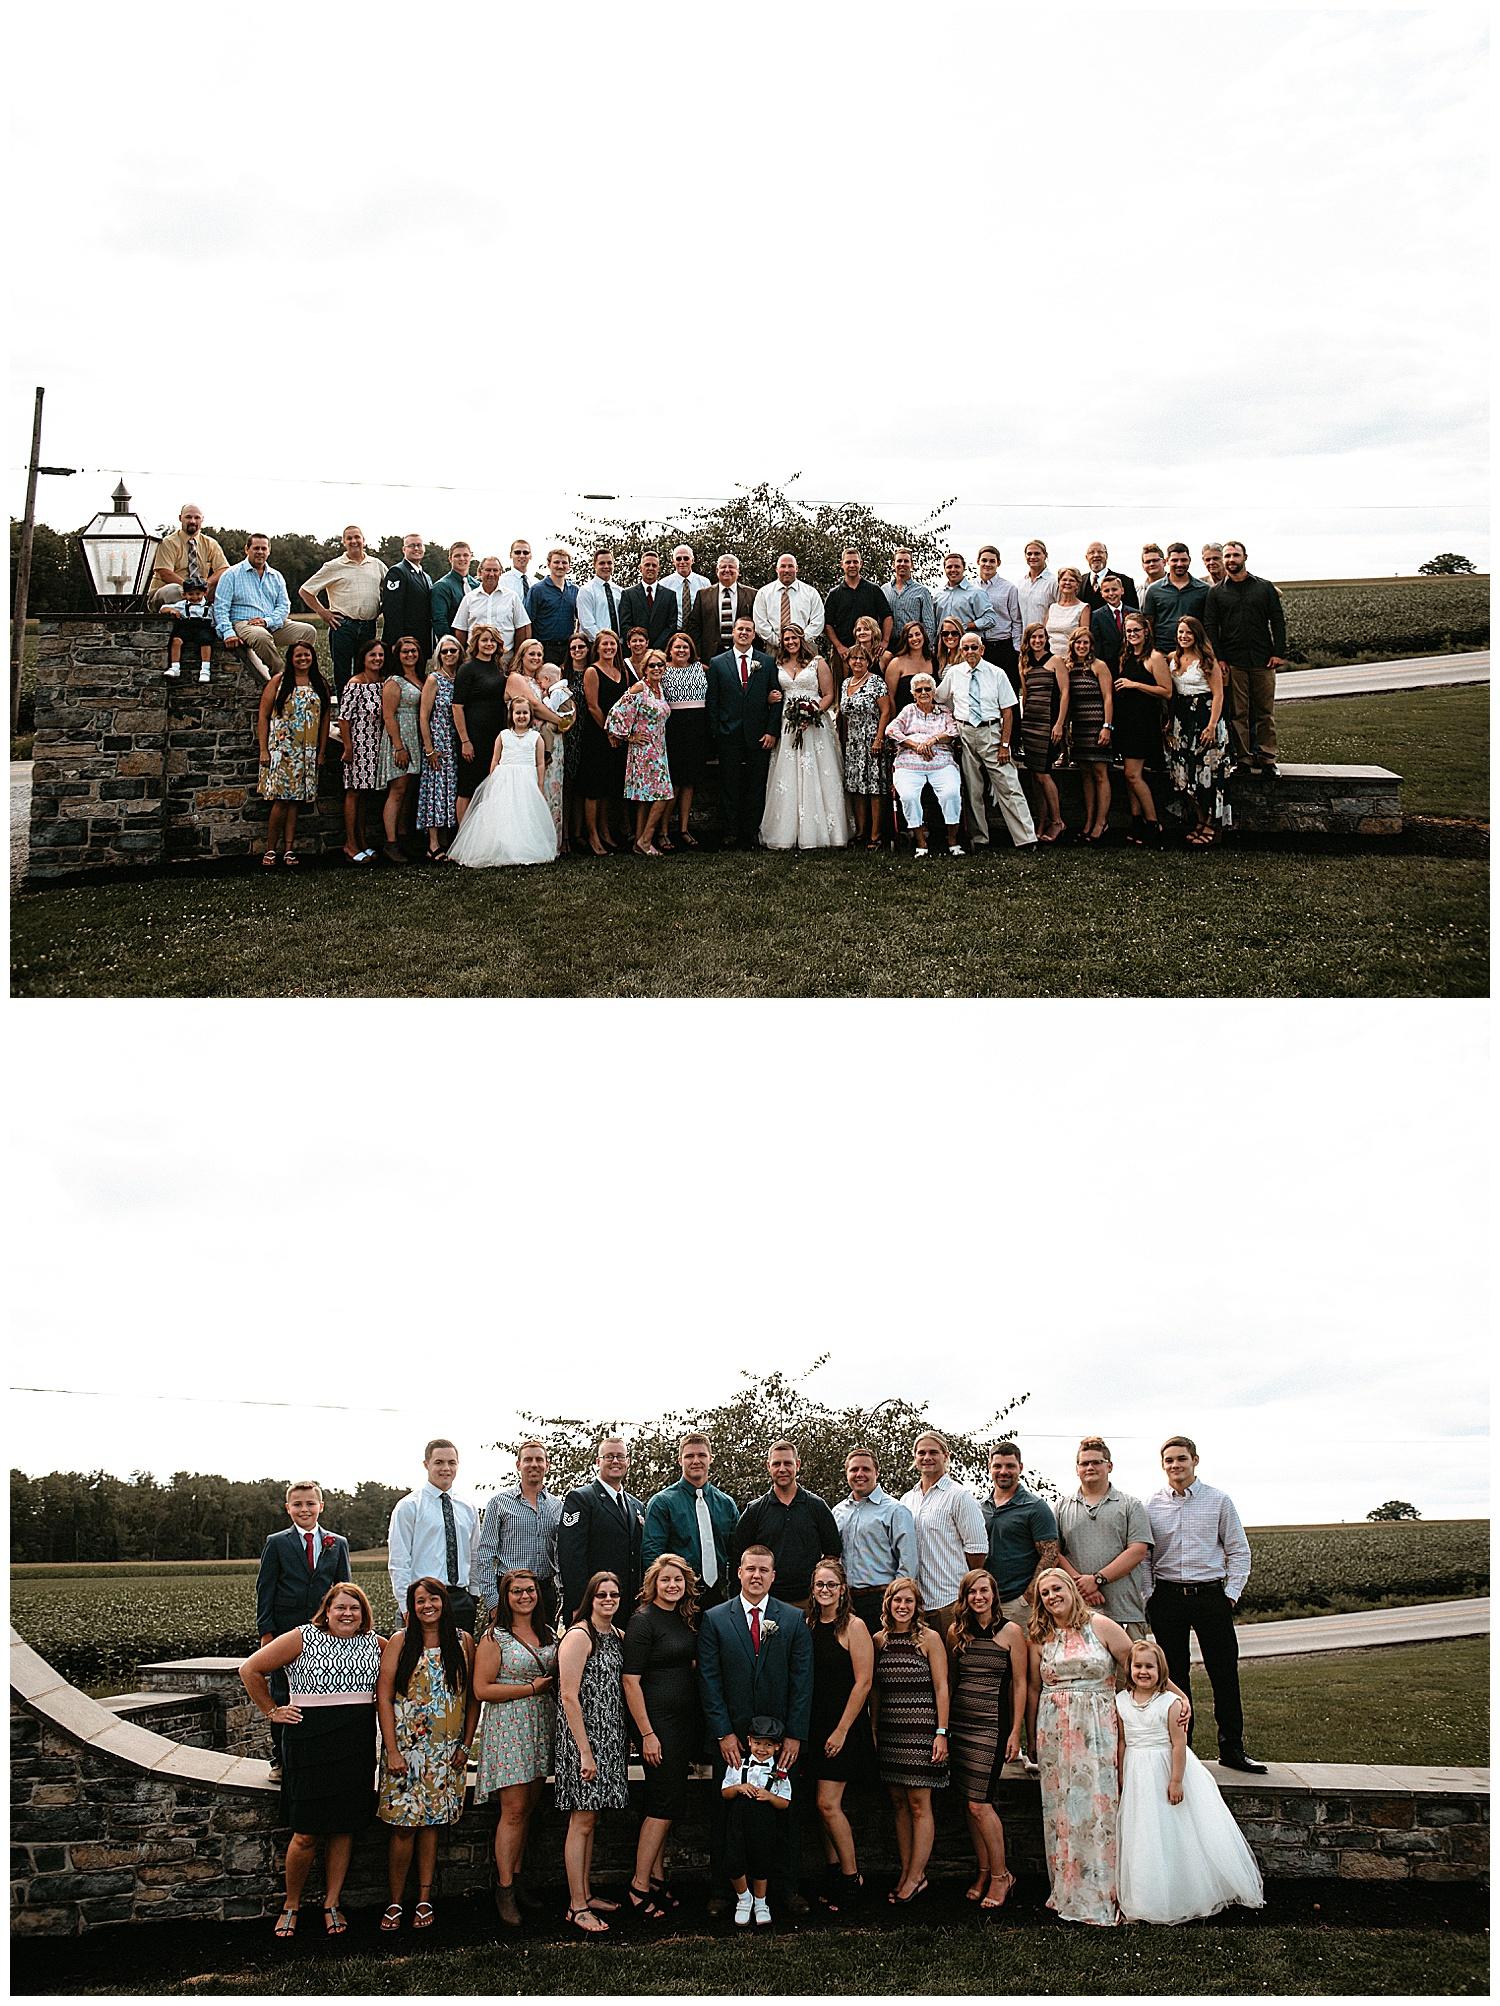 NEPA-Bloomgsburg-Wedding-Photographer-at-The-Barn-at-Greystone-Farms-Watsontown-PA_0084.jpg